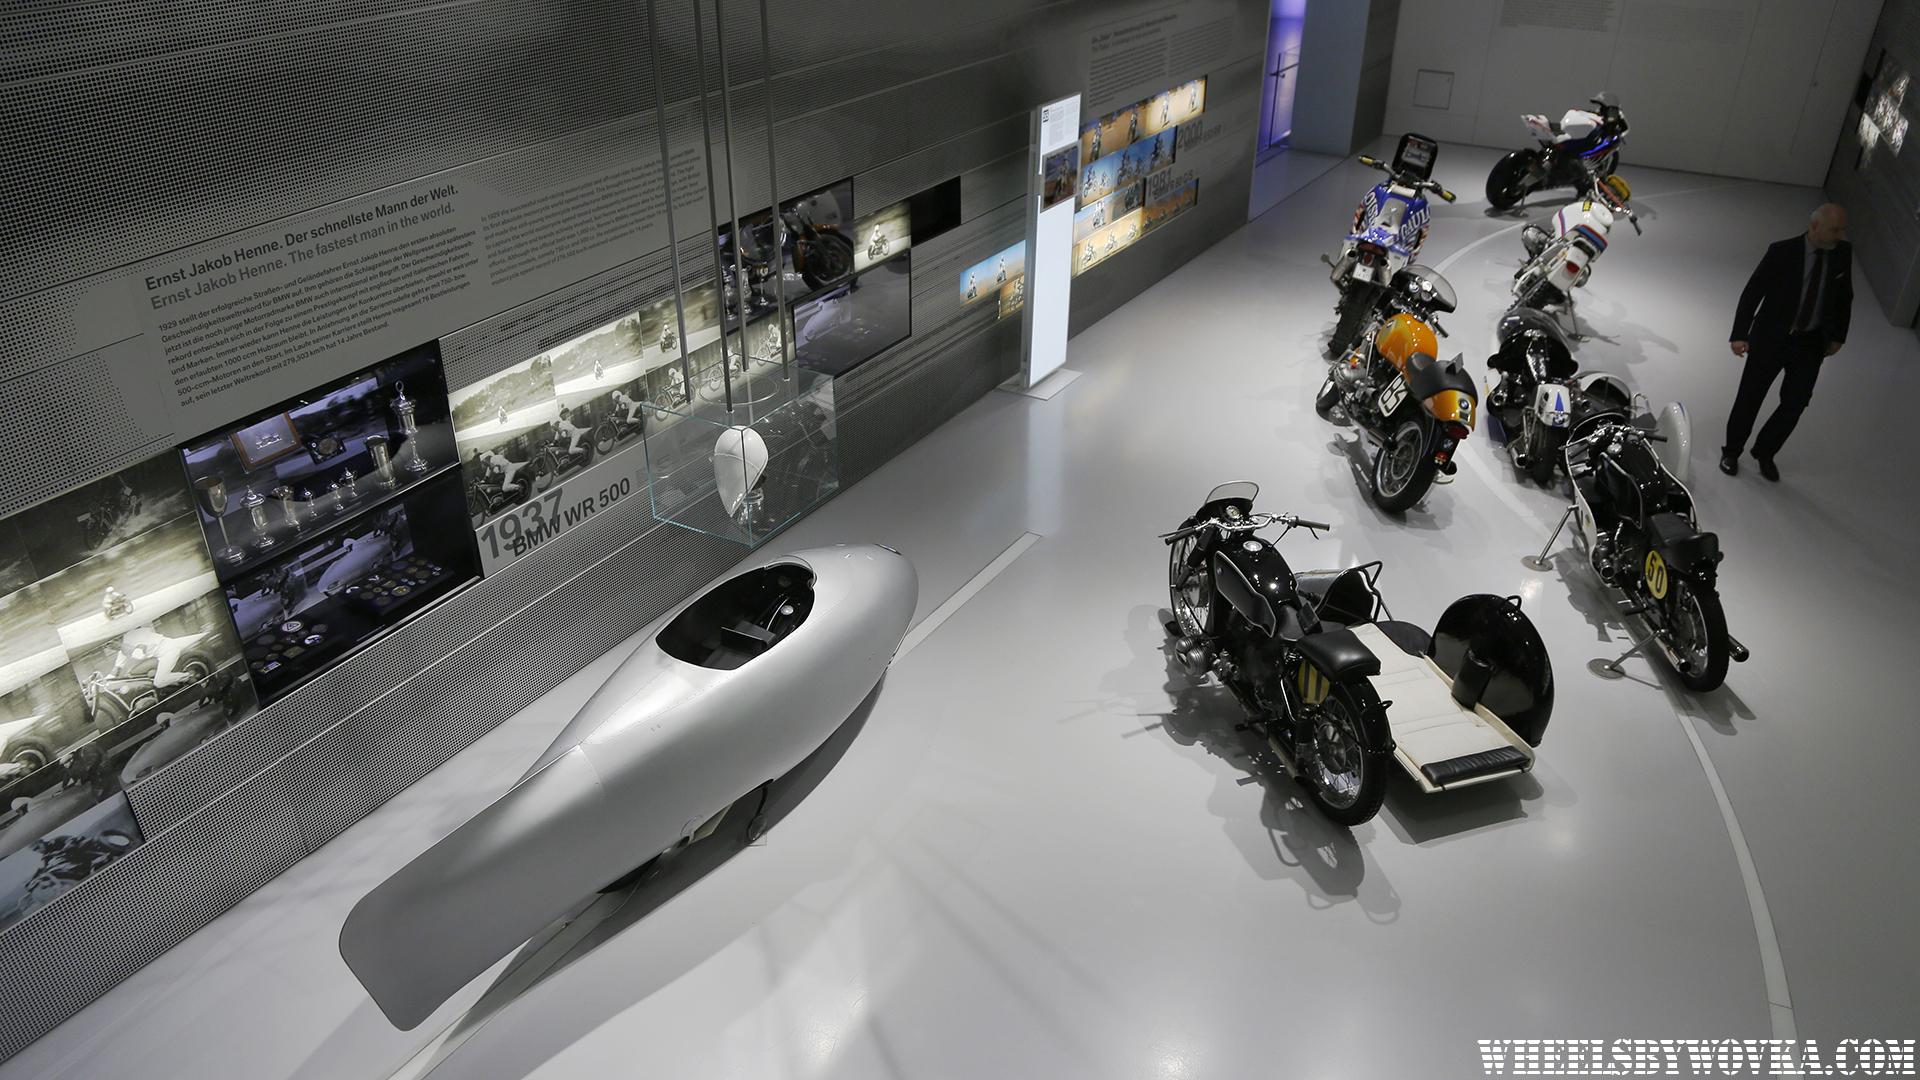 bmw-museum-welt-wheelsbywovka-6